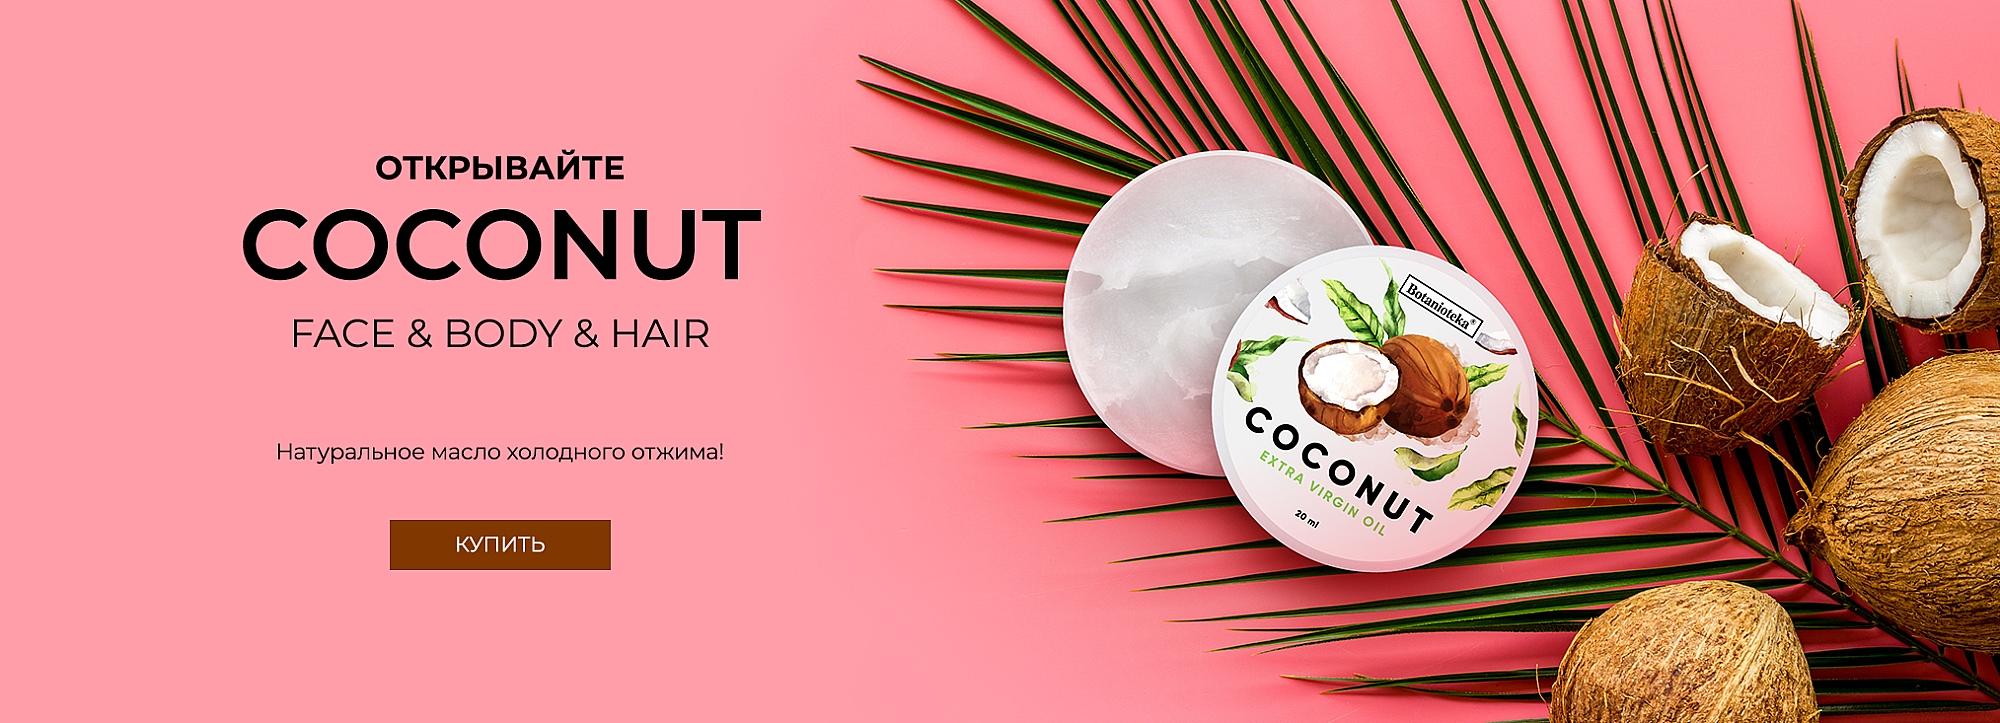 Botanioteka Coconut Oil221497